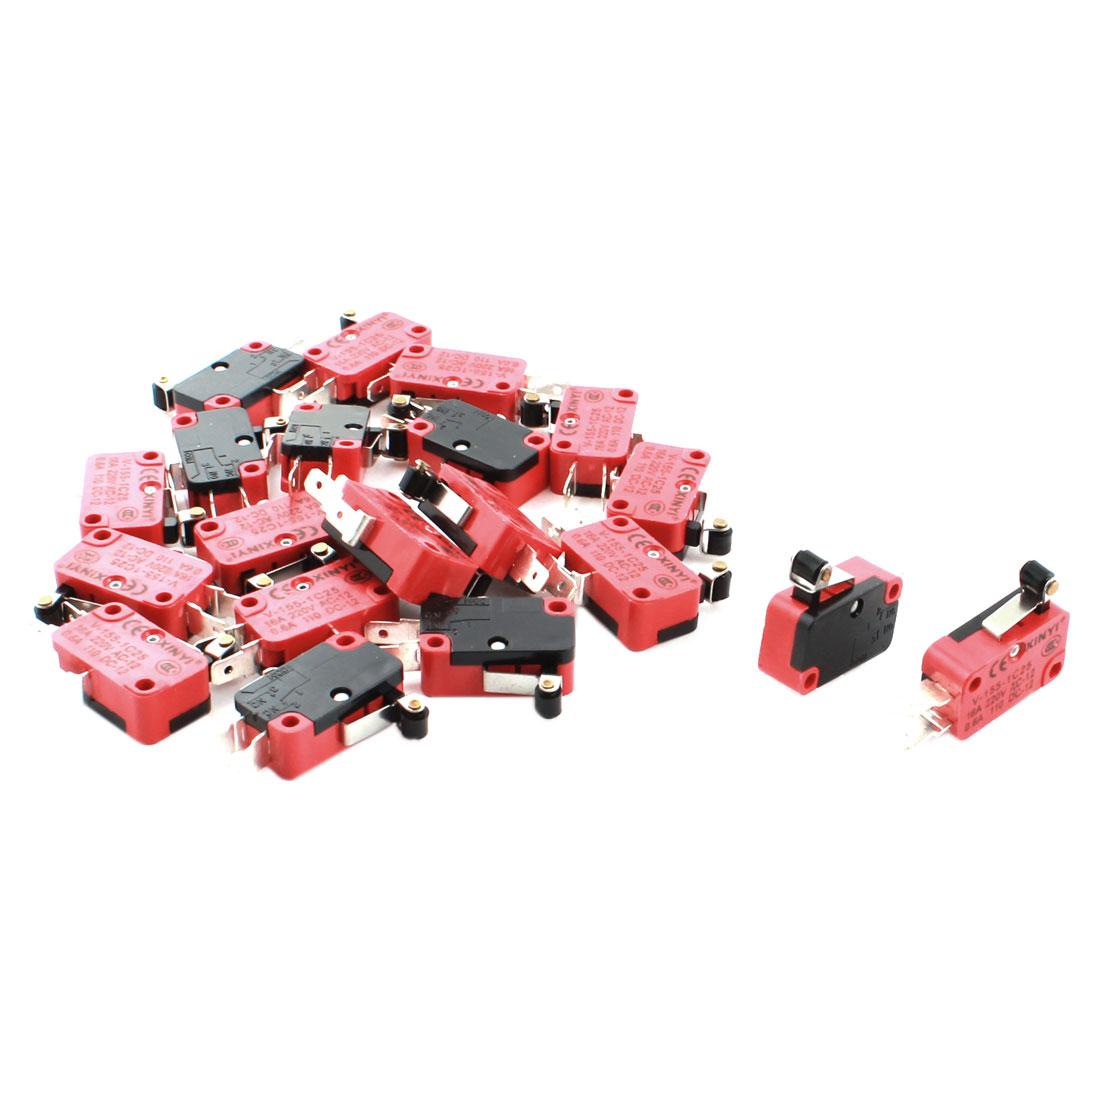 20 Pcs V-155-1C25 Micro Limit Switch Short Roller Lever Arm SPDT Snap Action New